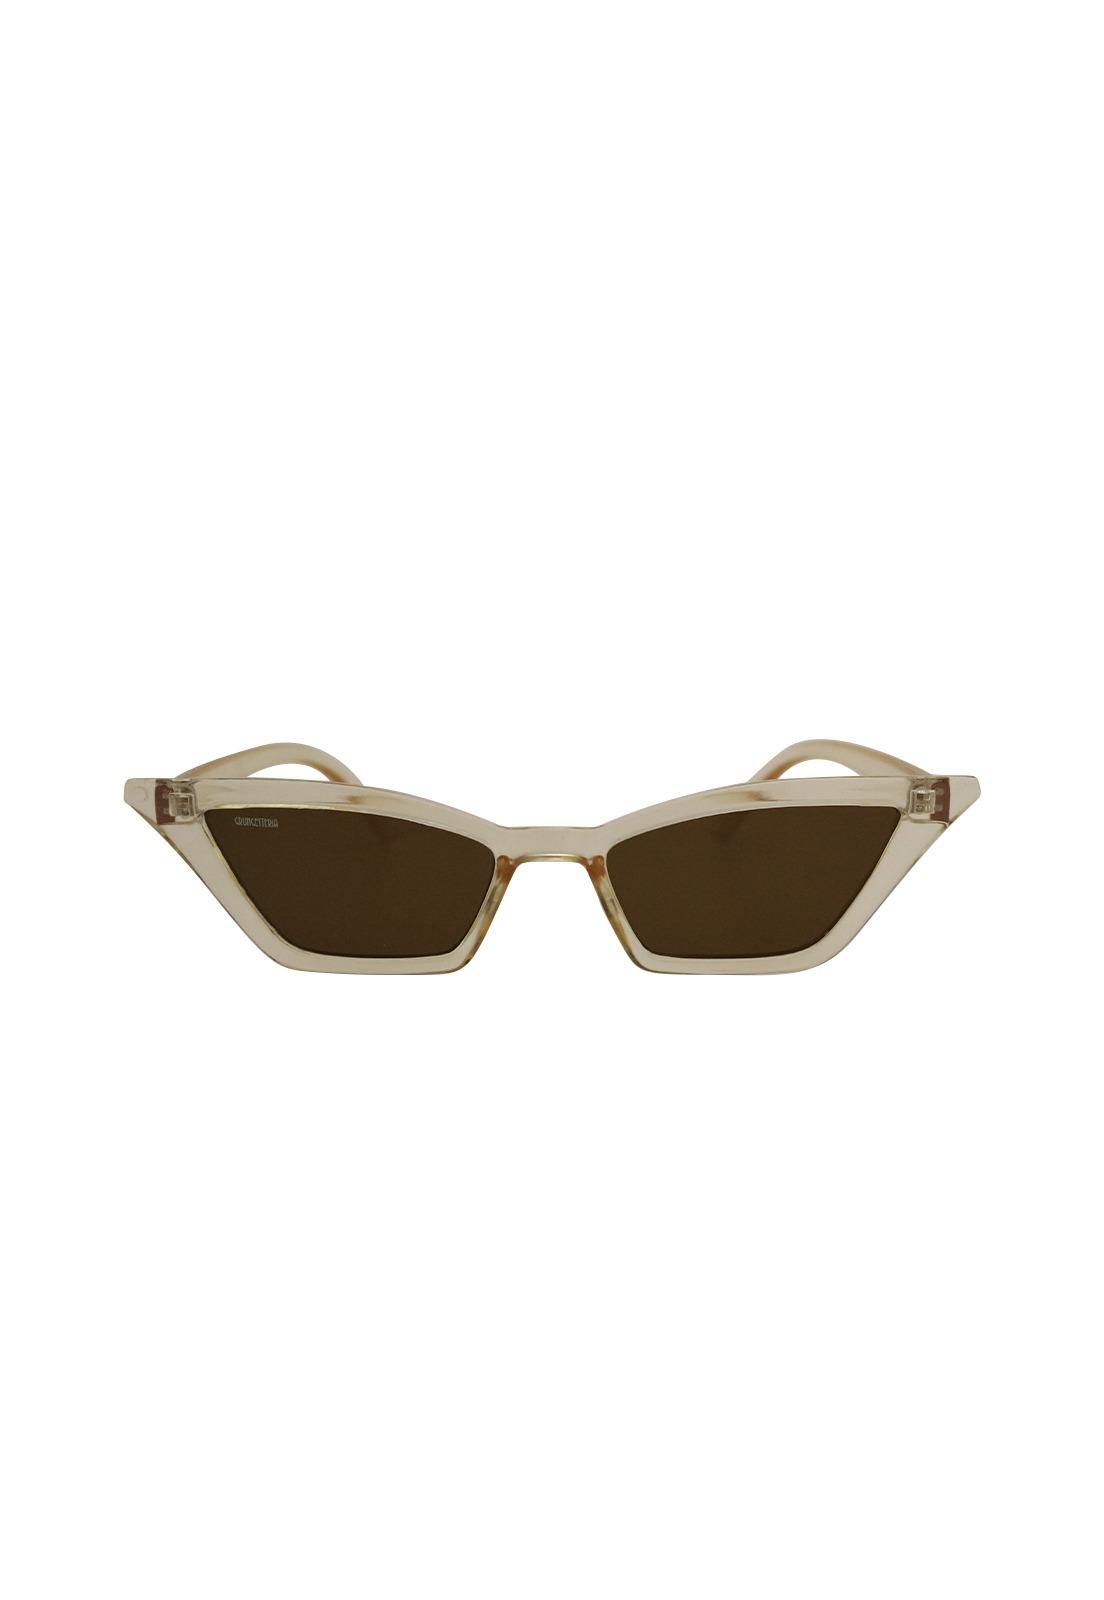 Óculos de Sol Grungetteria Devil's Cat Transparente